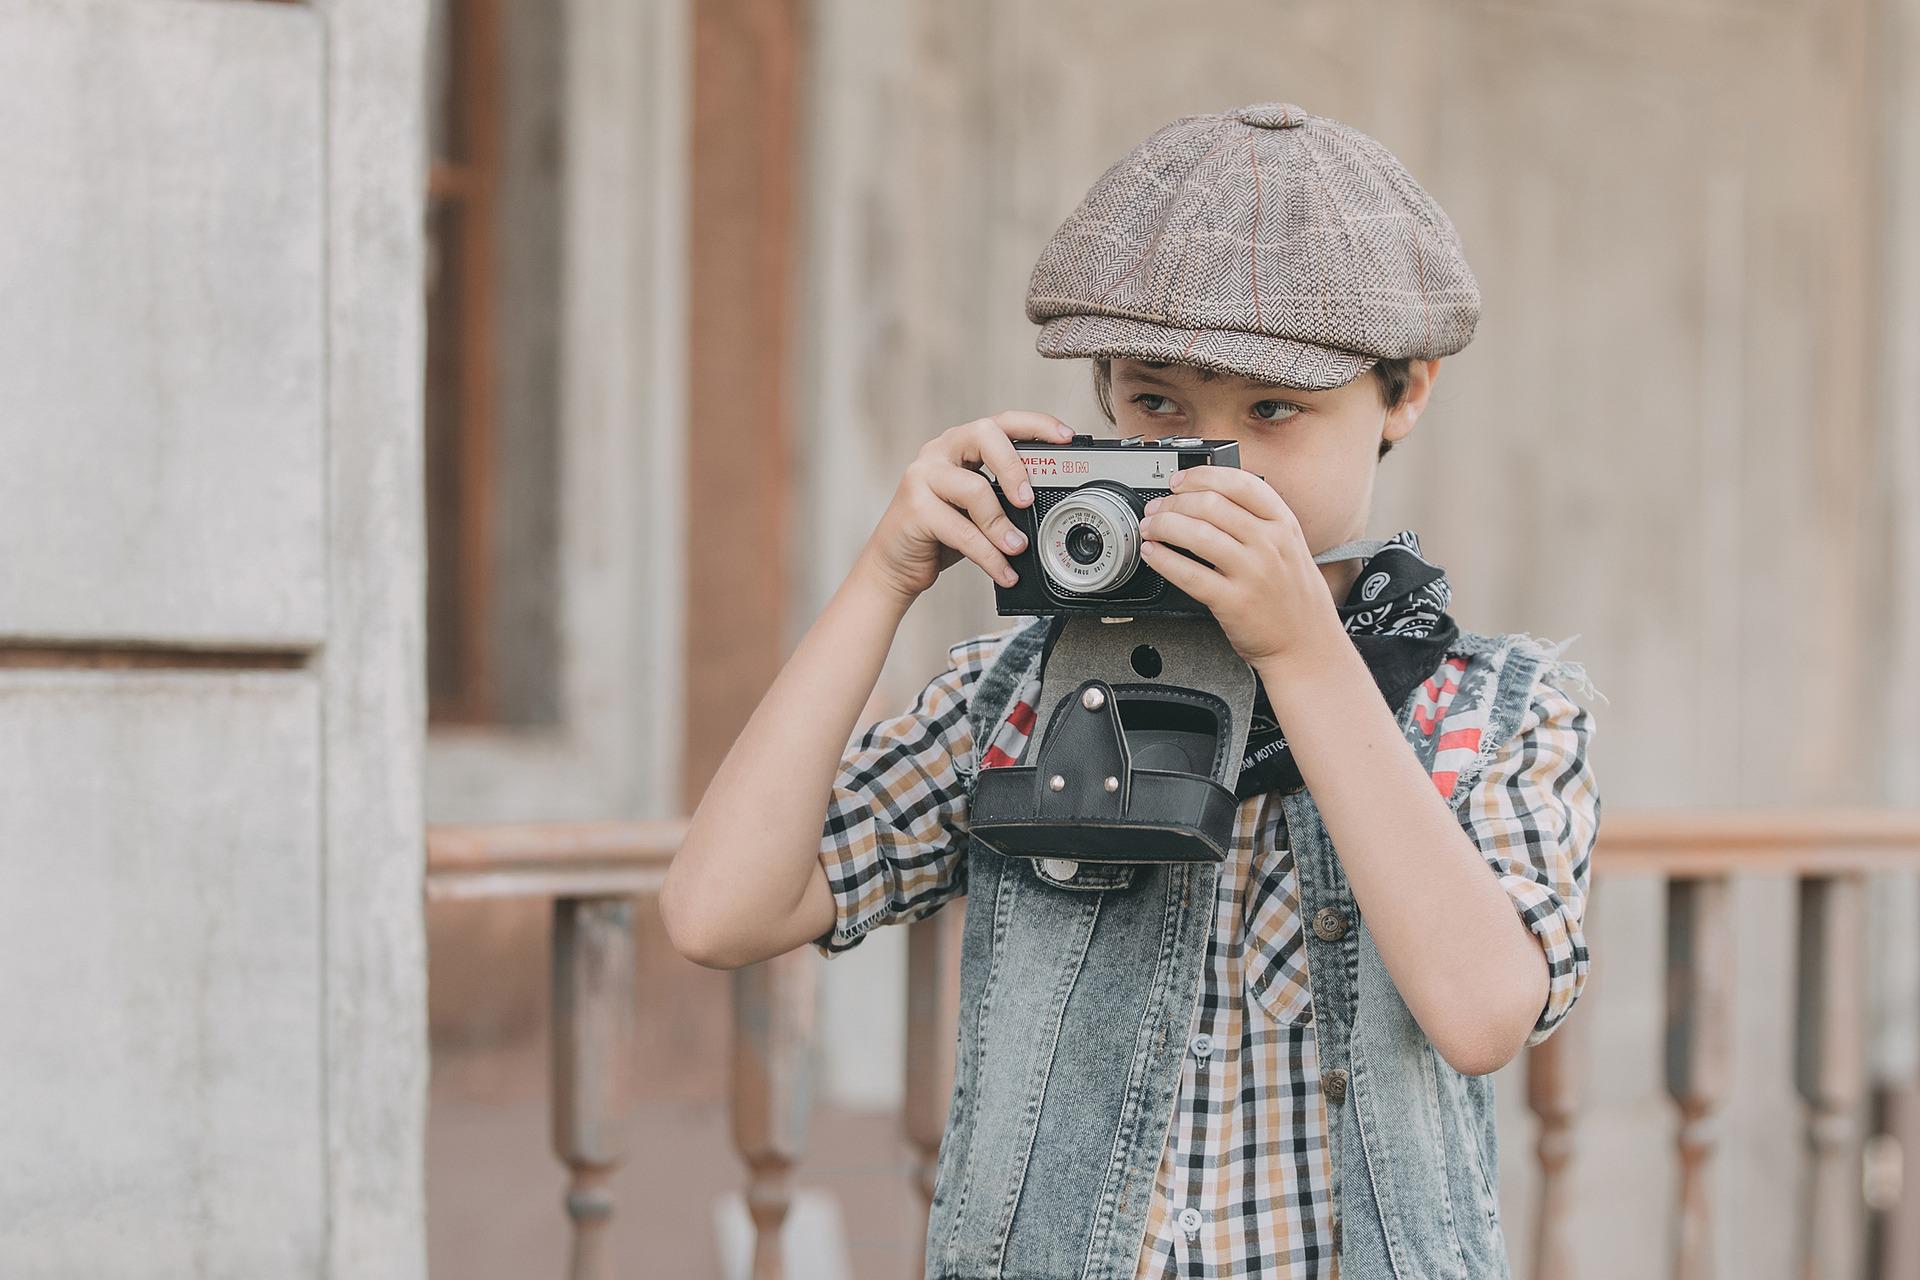 camera-4921641_1920